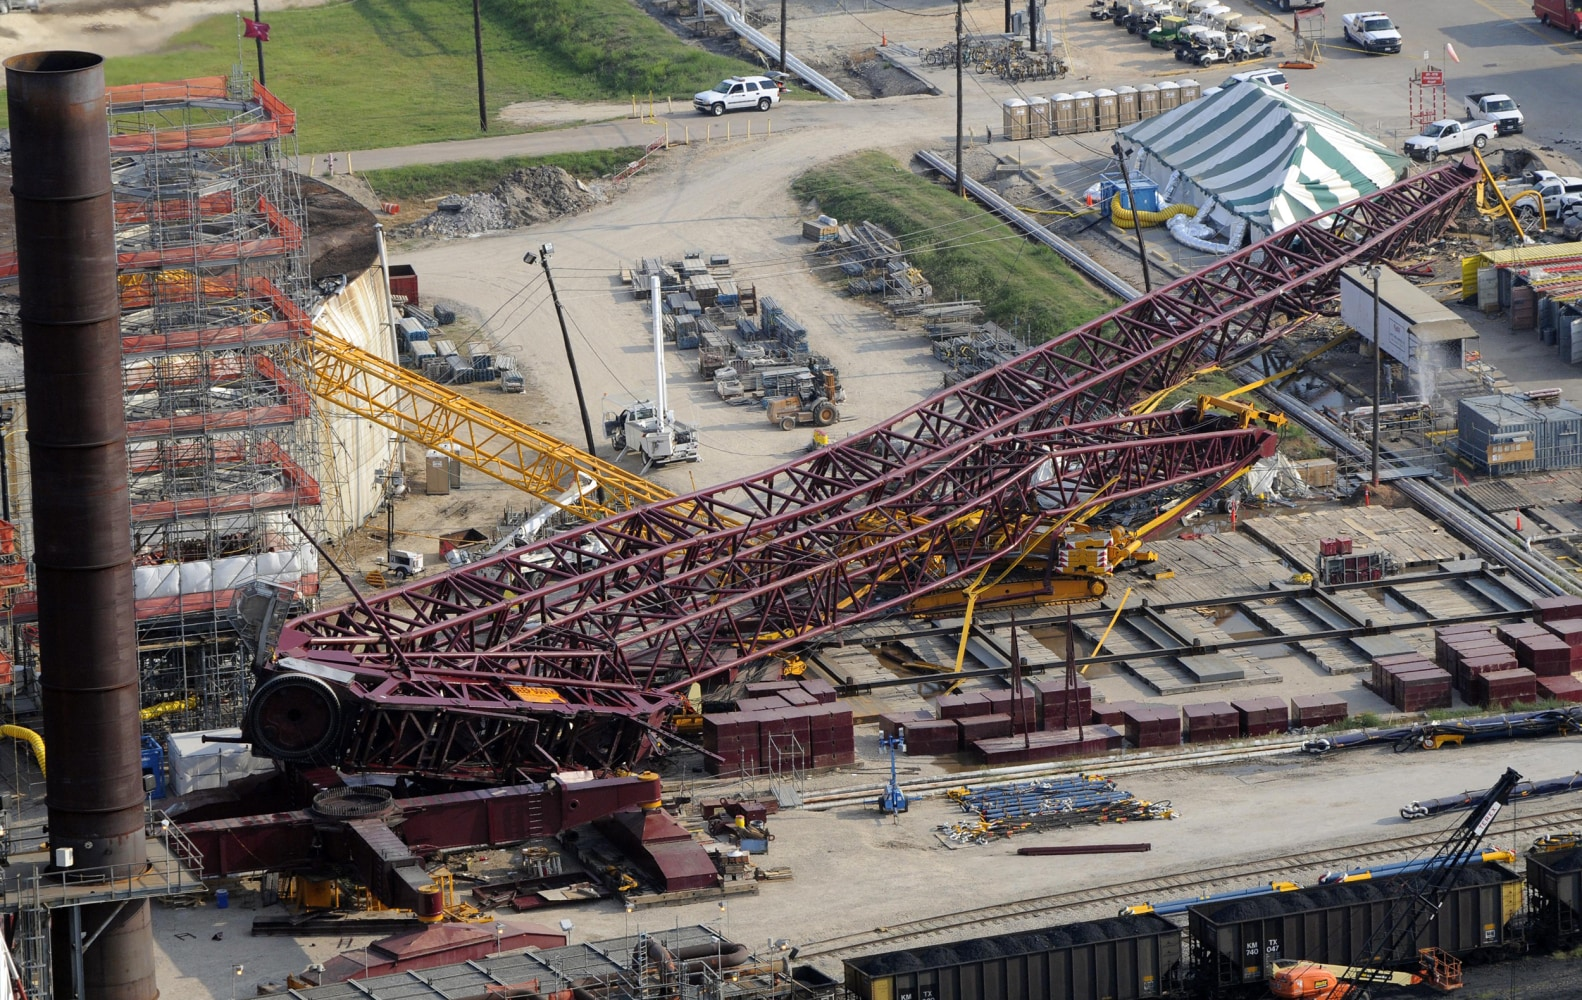 http://media4.s-nbcnews.com/j/newscms/2016_05/1405451/160205-texas-crane-collapse-1154a_f422ec31b67f577dda05ef6f4df140bf.nbcnews-ux-2880-1000.jpg